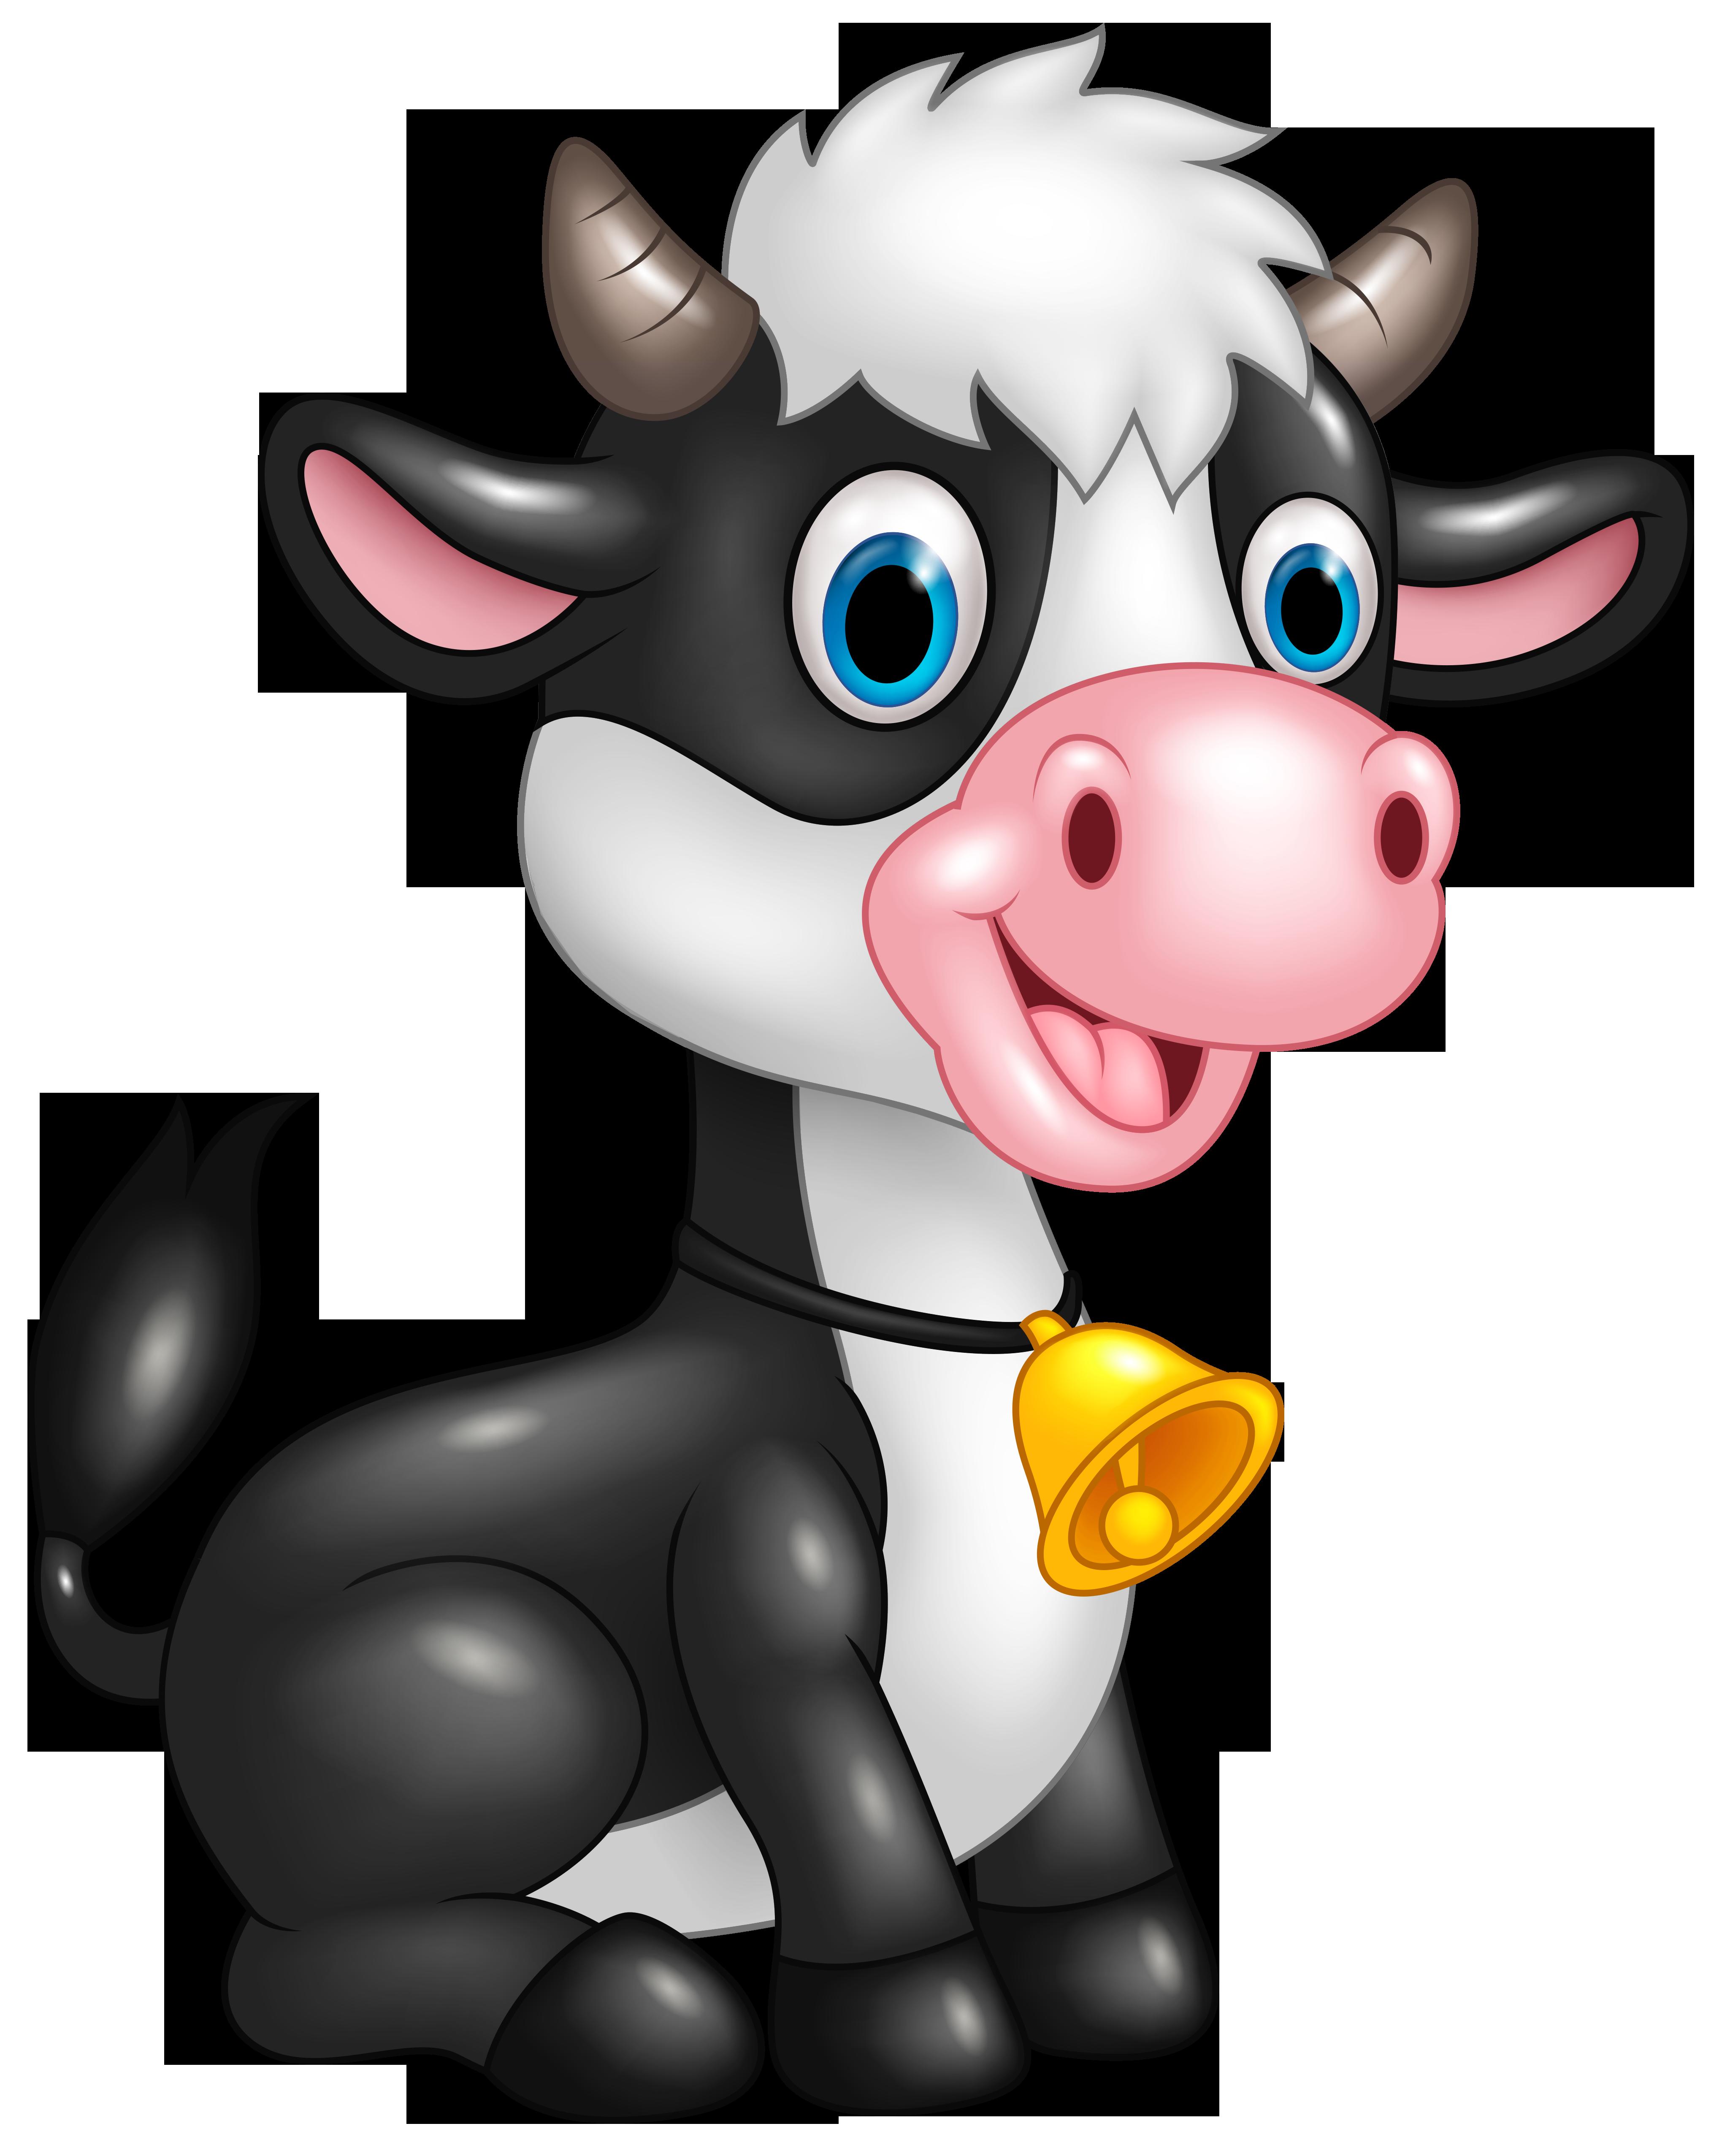 4099x5108 Cute Cow Cartoon Png Clipart Imageu200b Gallery Yopriceville